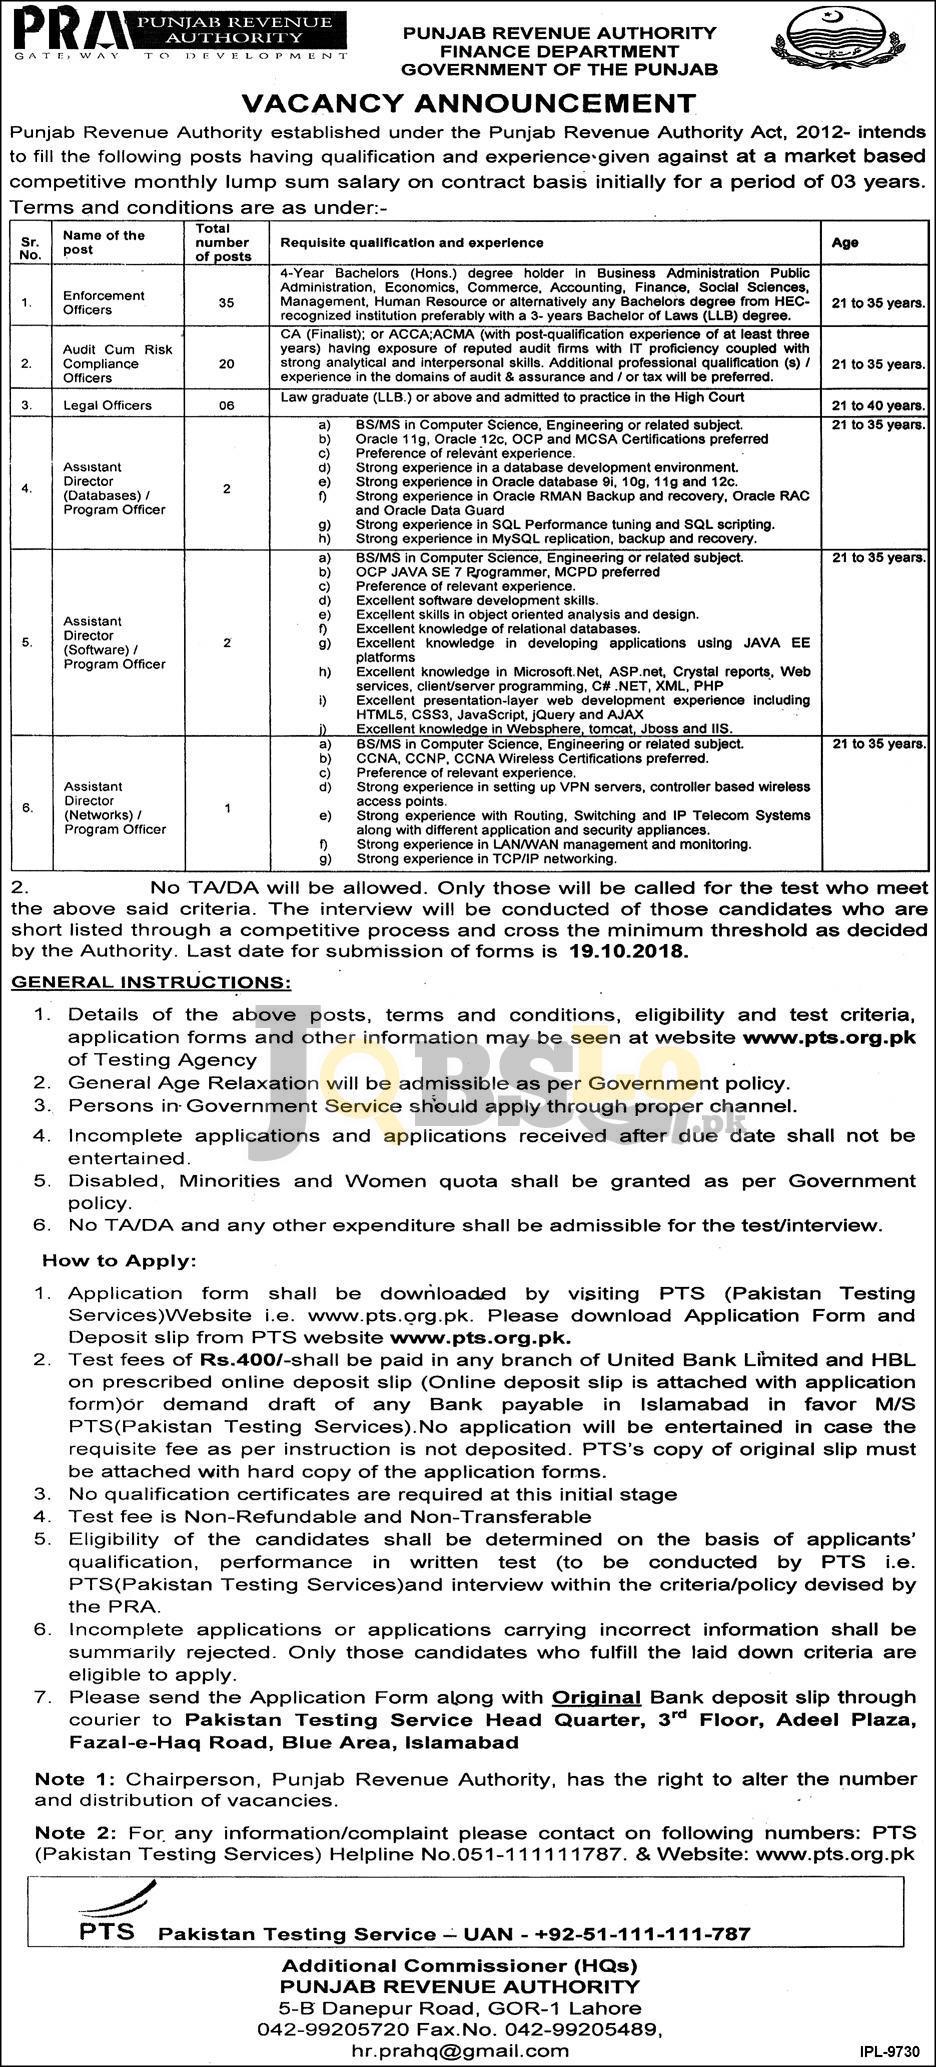 Punjab Revenue Authority PRA Jobs 2018 PTS Application Form Download